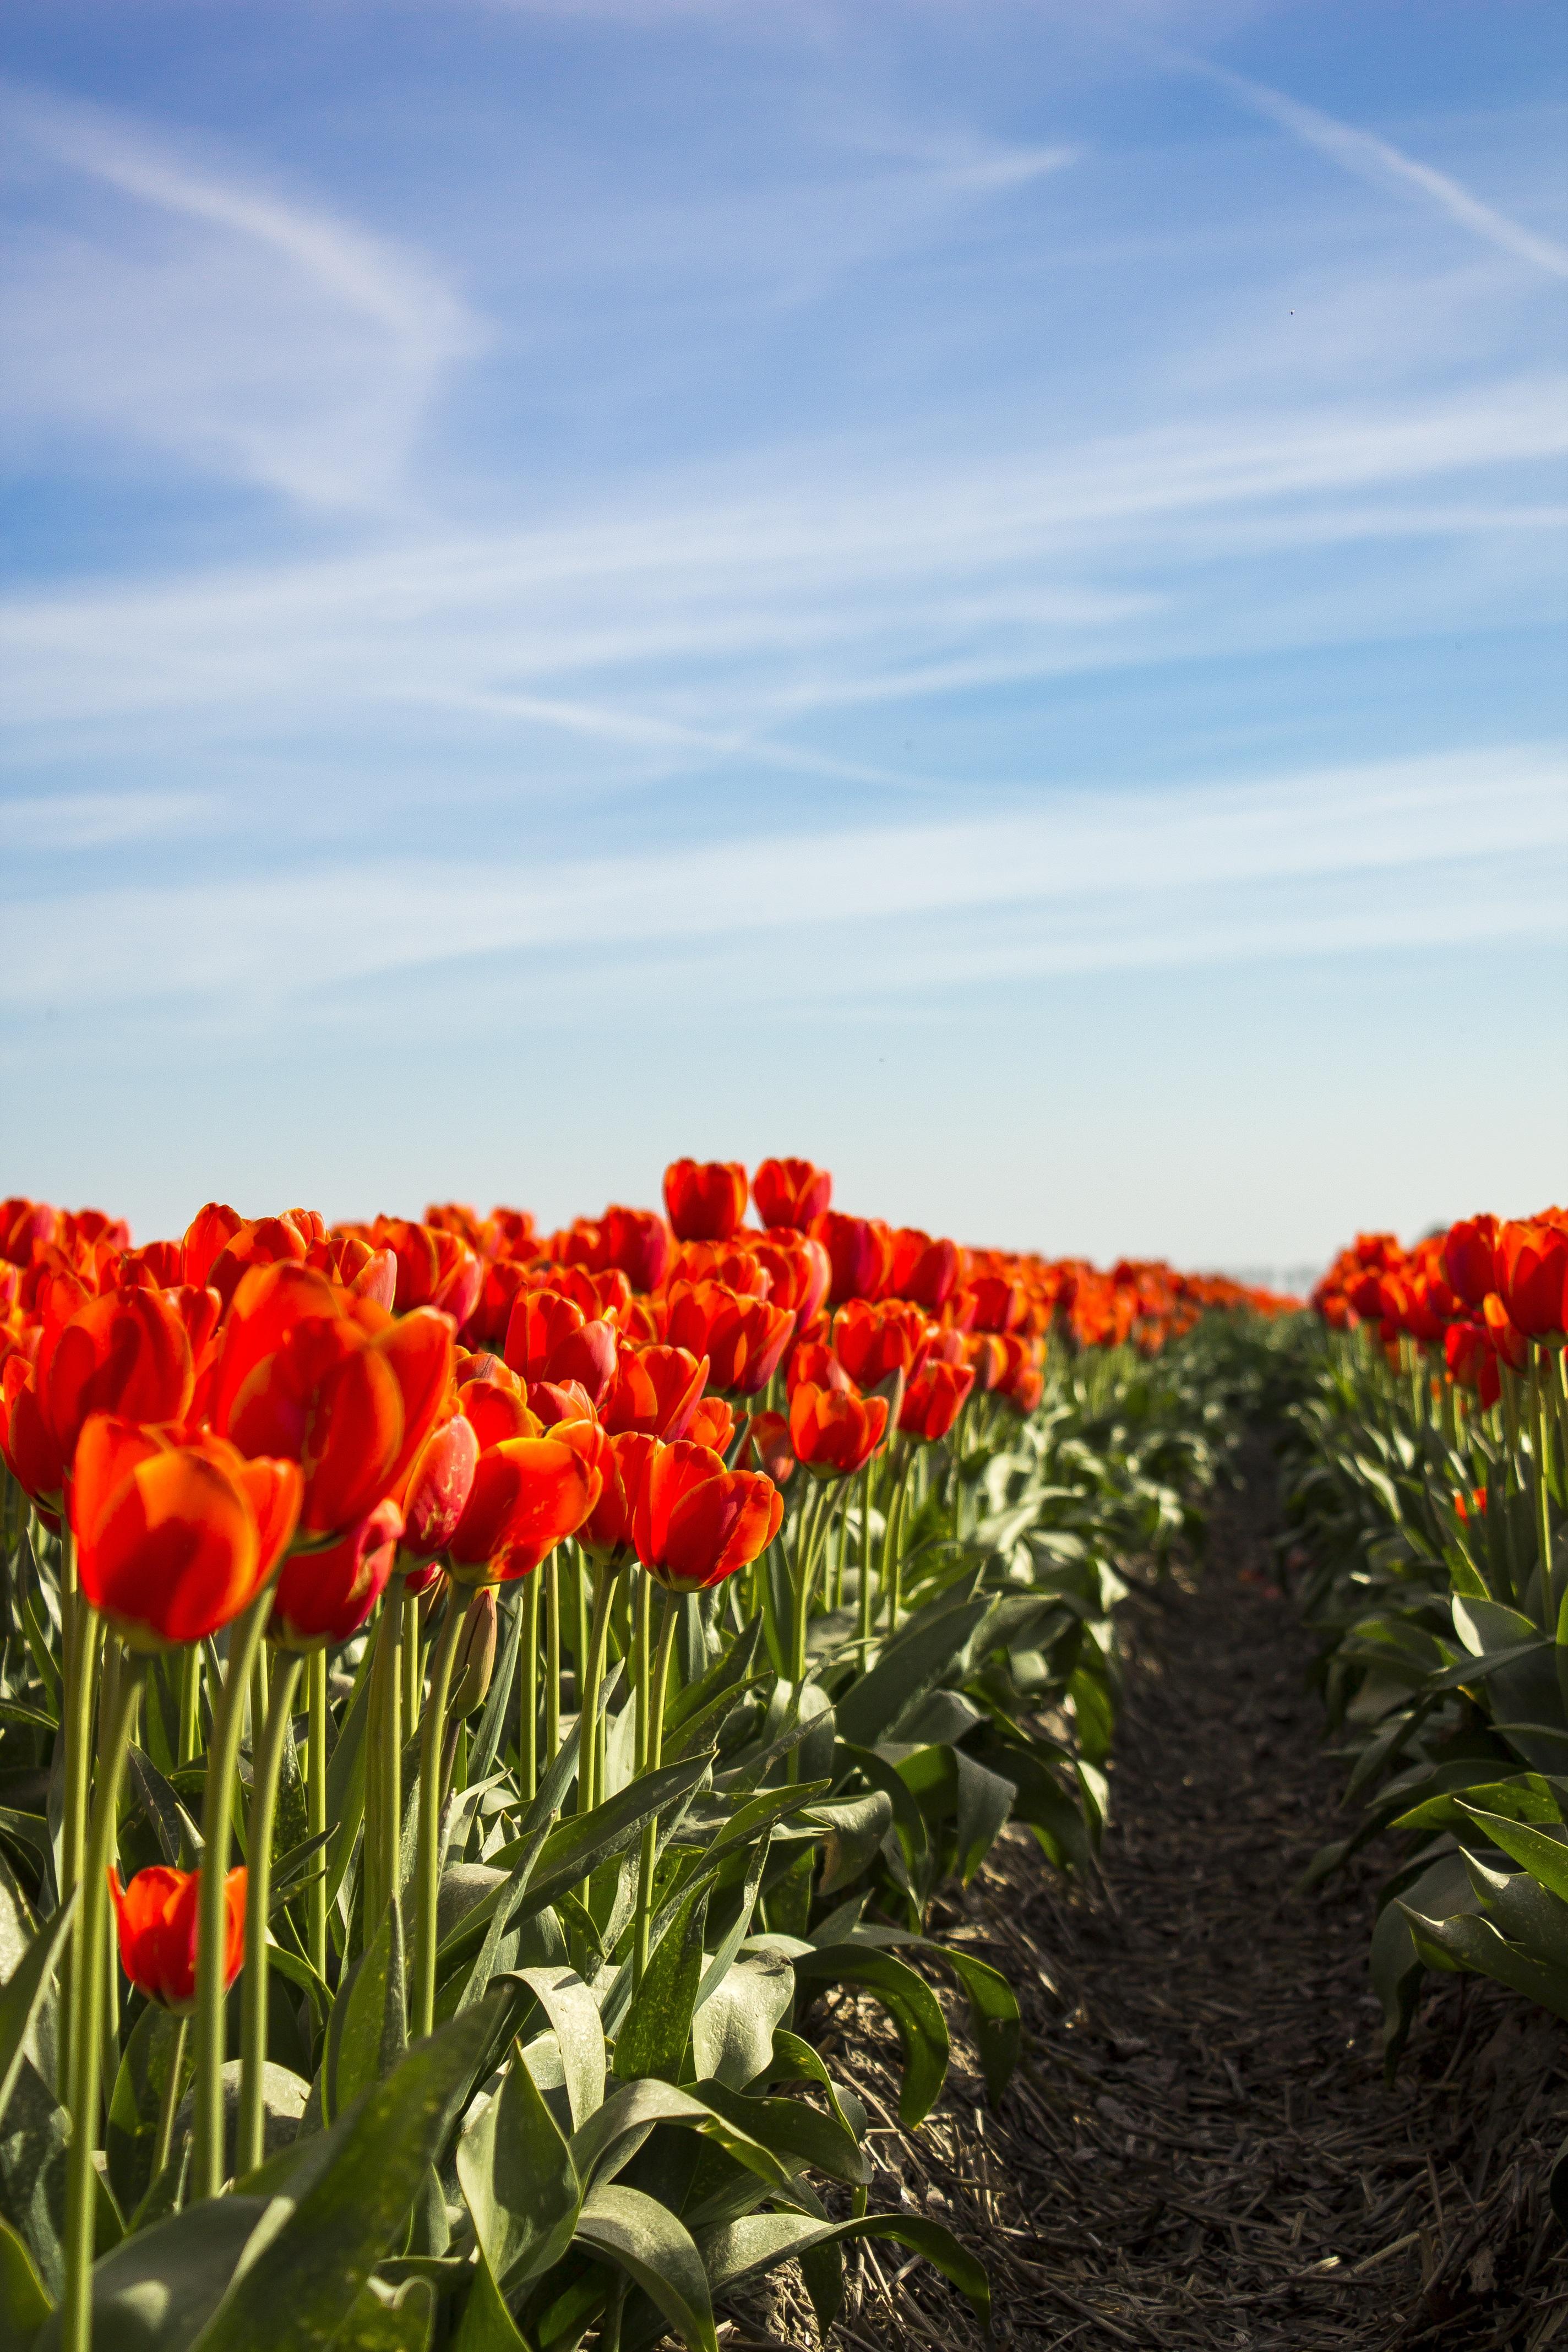 целозия выращивание из семян в домашних условиях фото пошагово